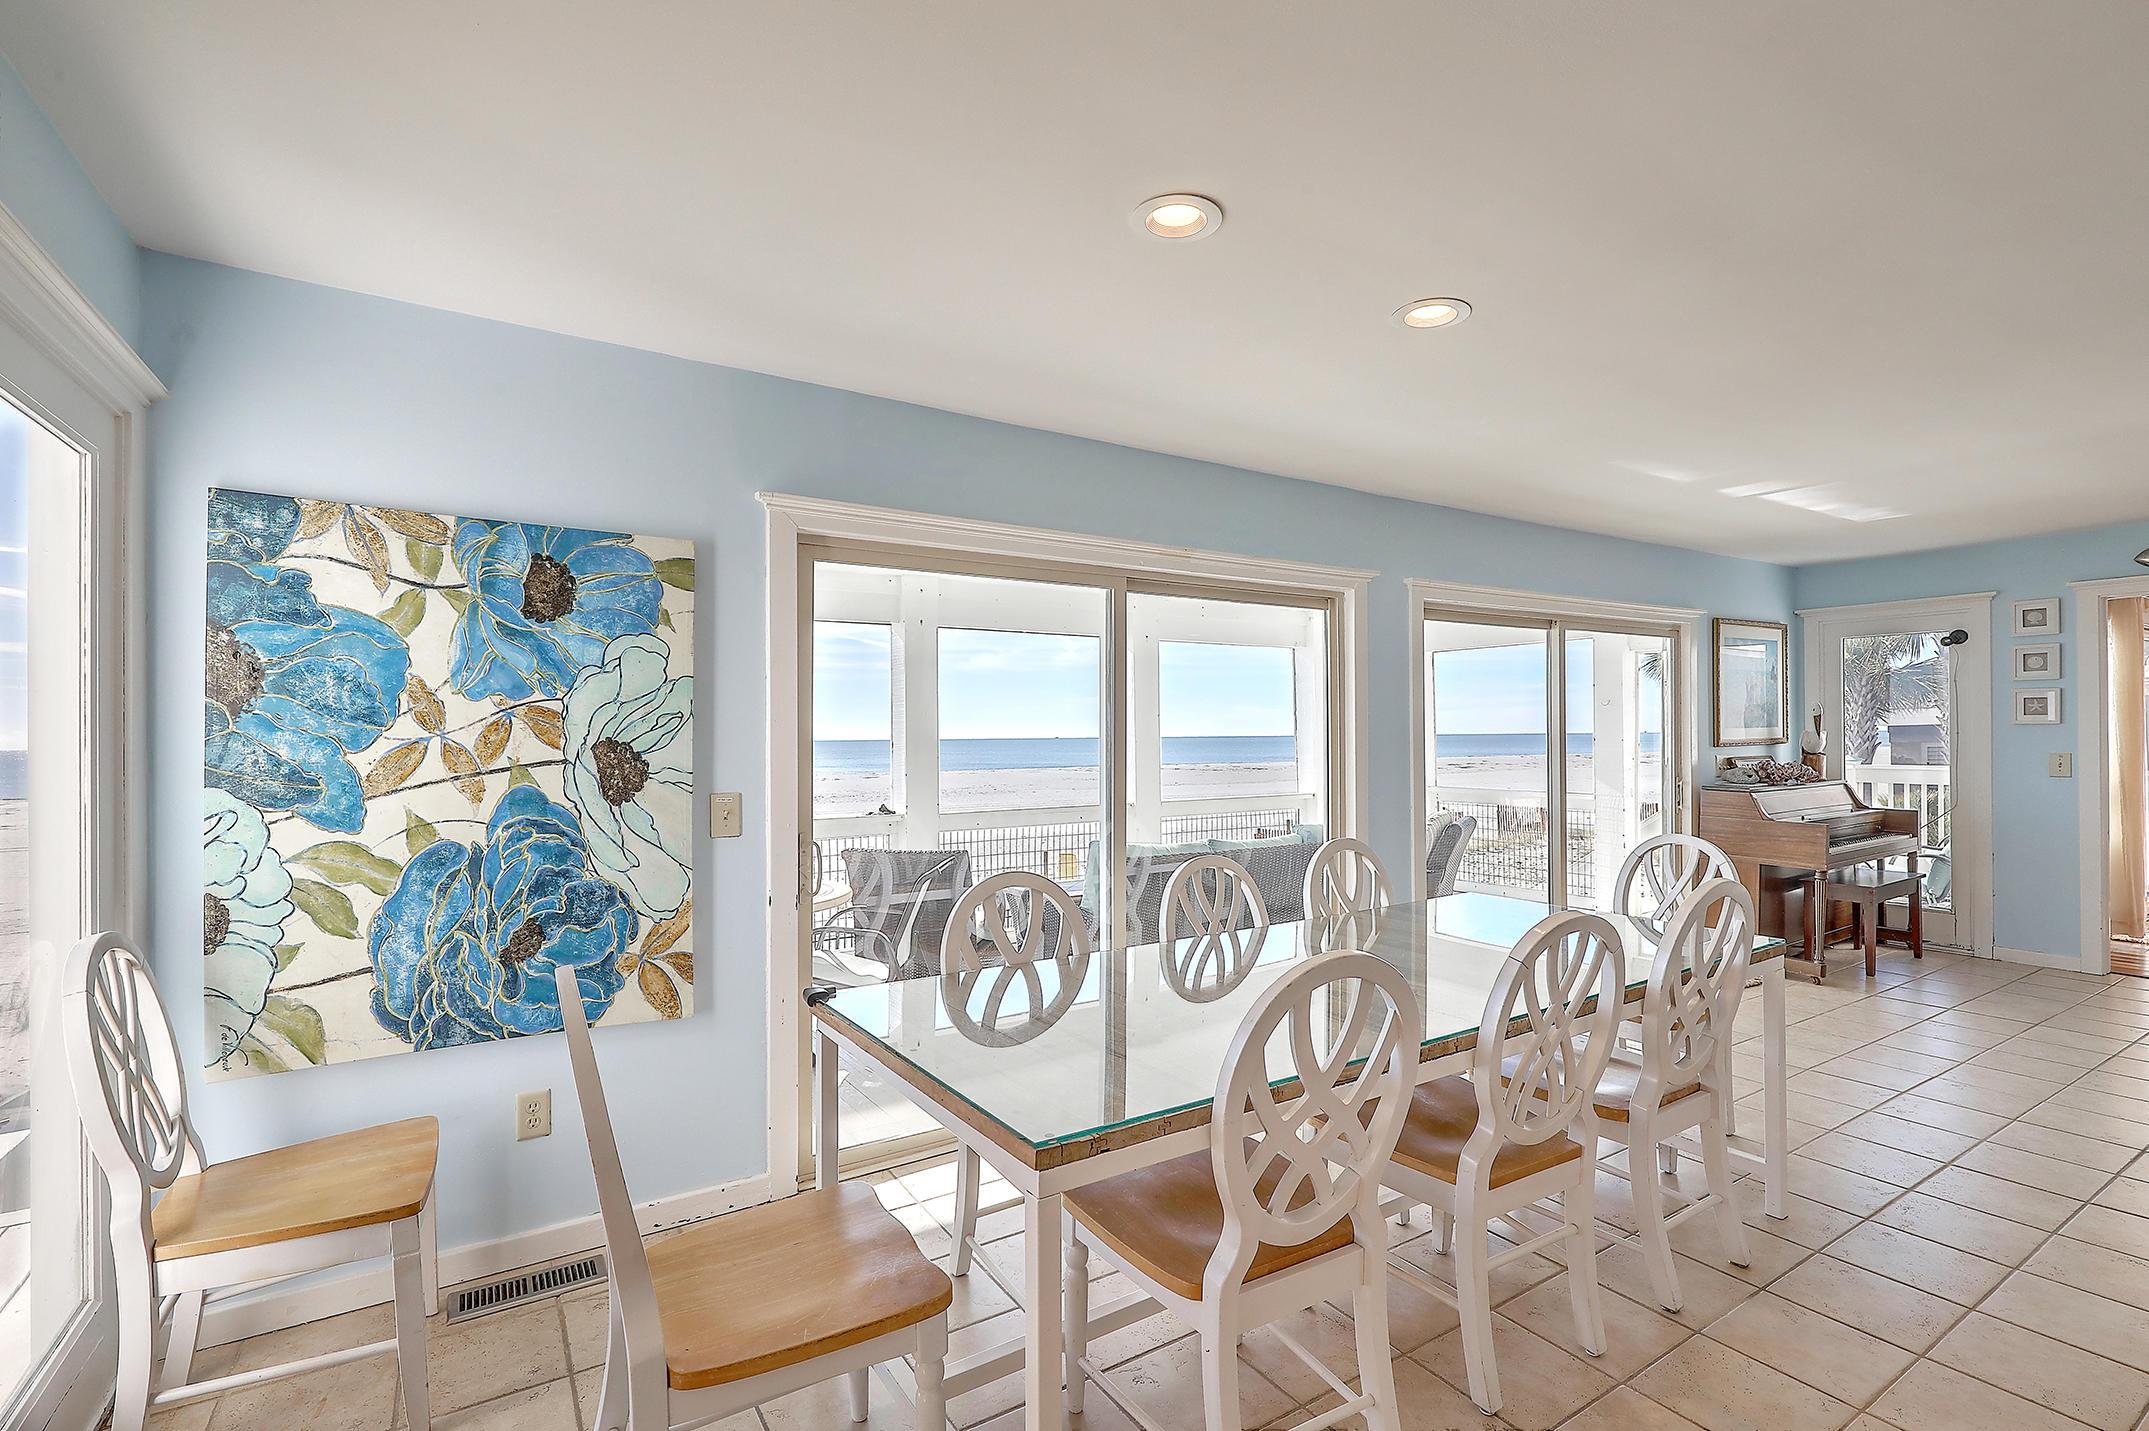 Wild Dunes Homes For Sale - 14 Beachwood East, Isle of Palms, SC - 14